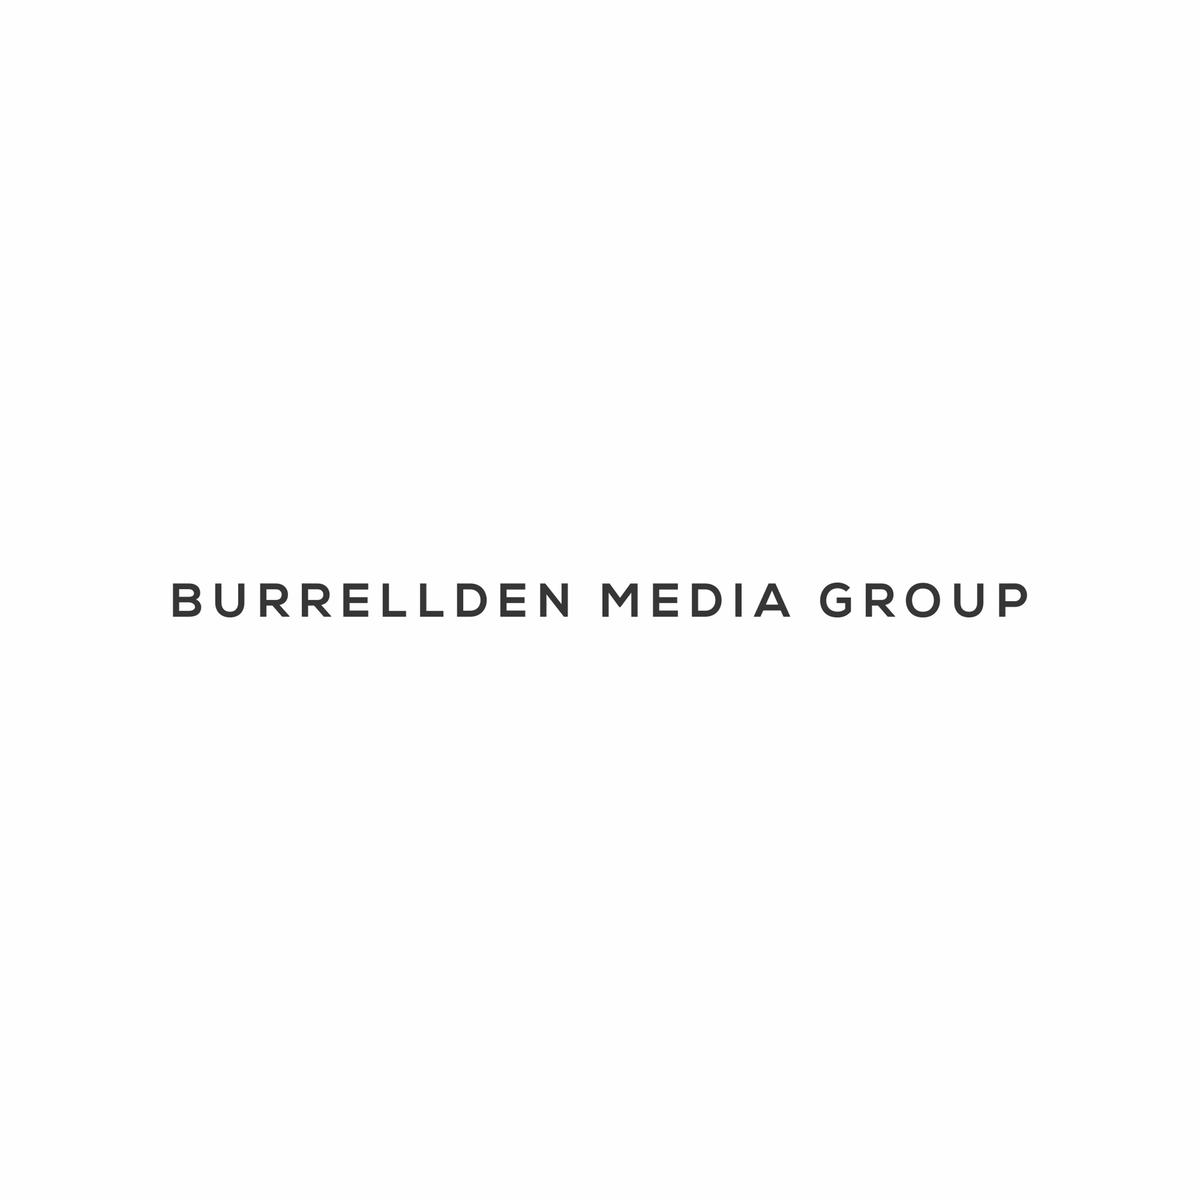 Creative assets for Burellden Media Group